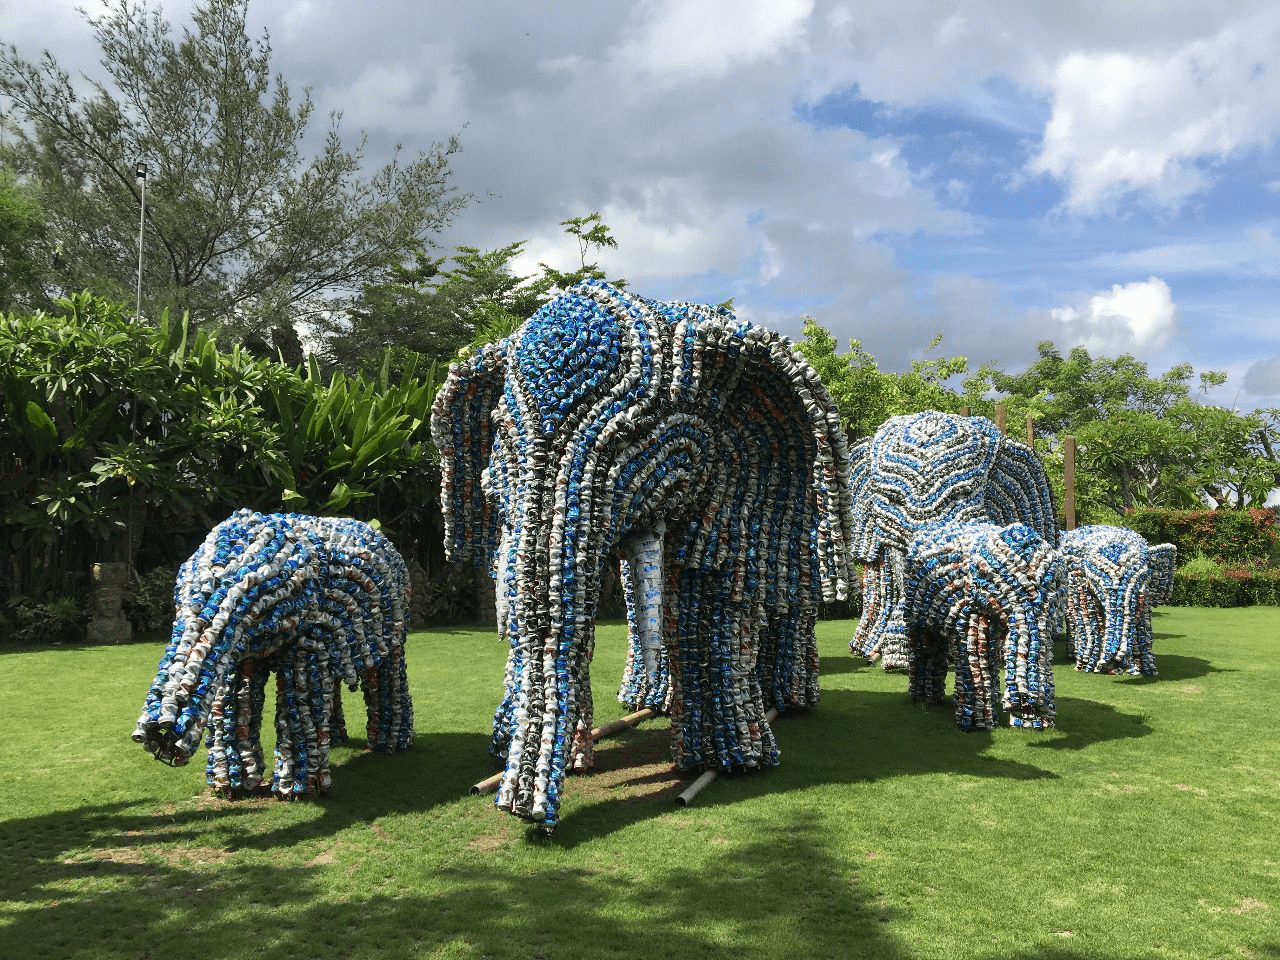 Bali - aluminium elephants